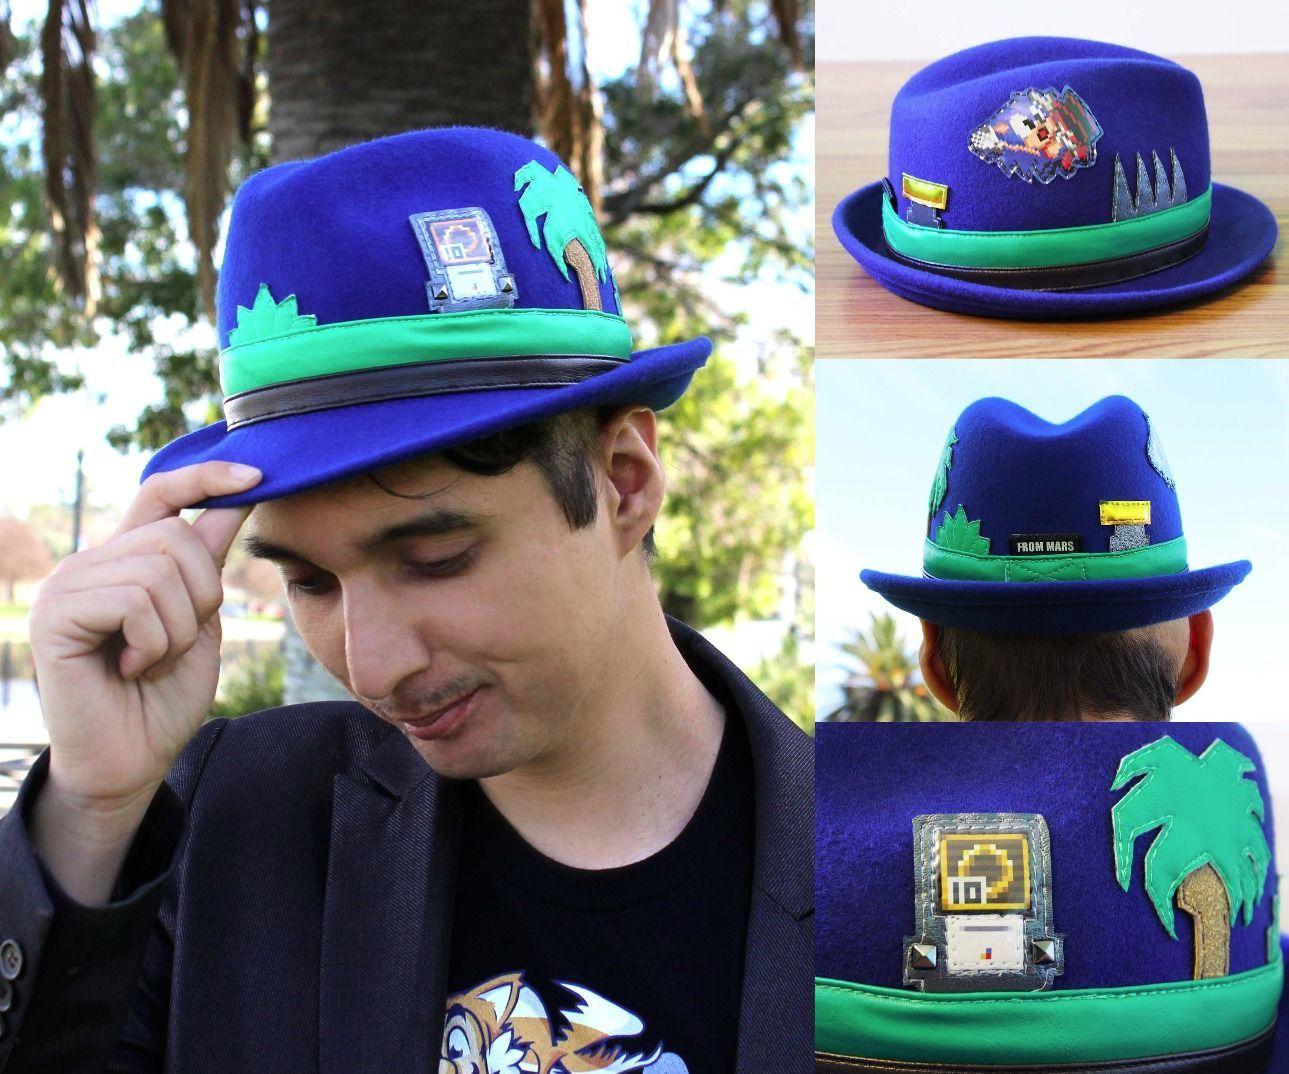 DIY Sonic the Hedgehog Hat